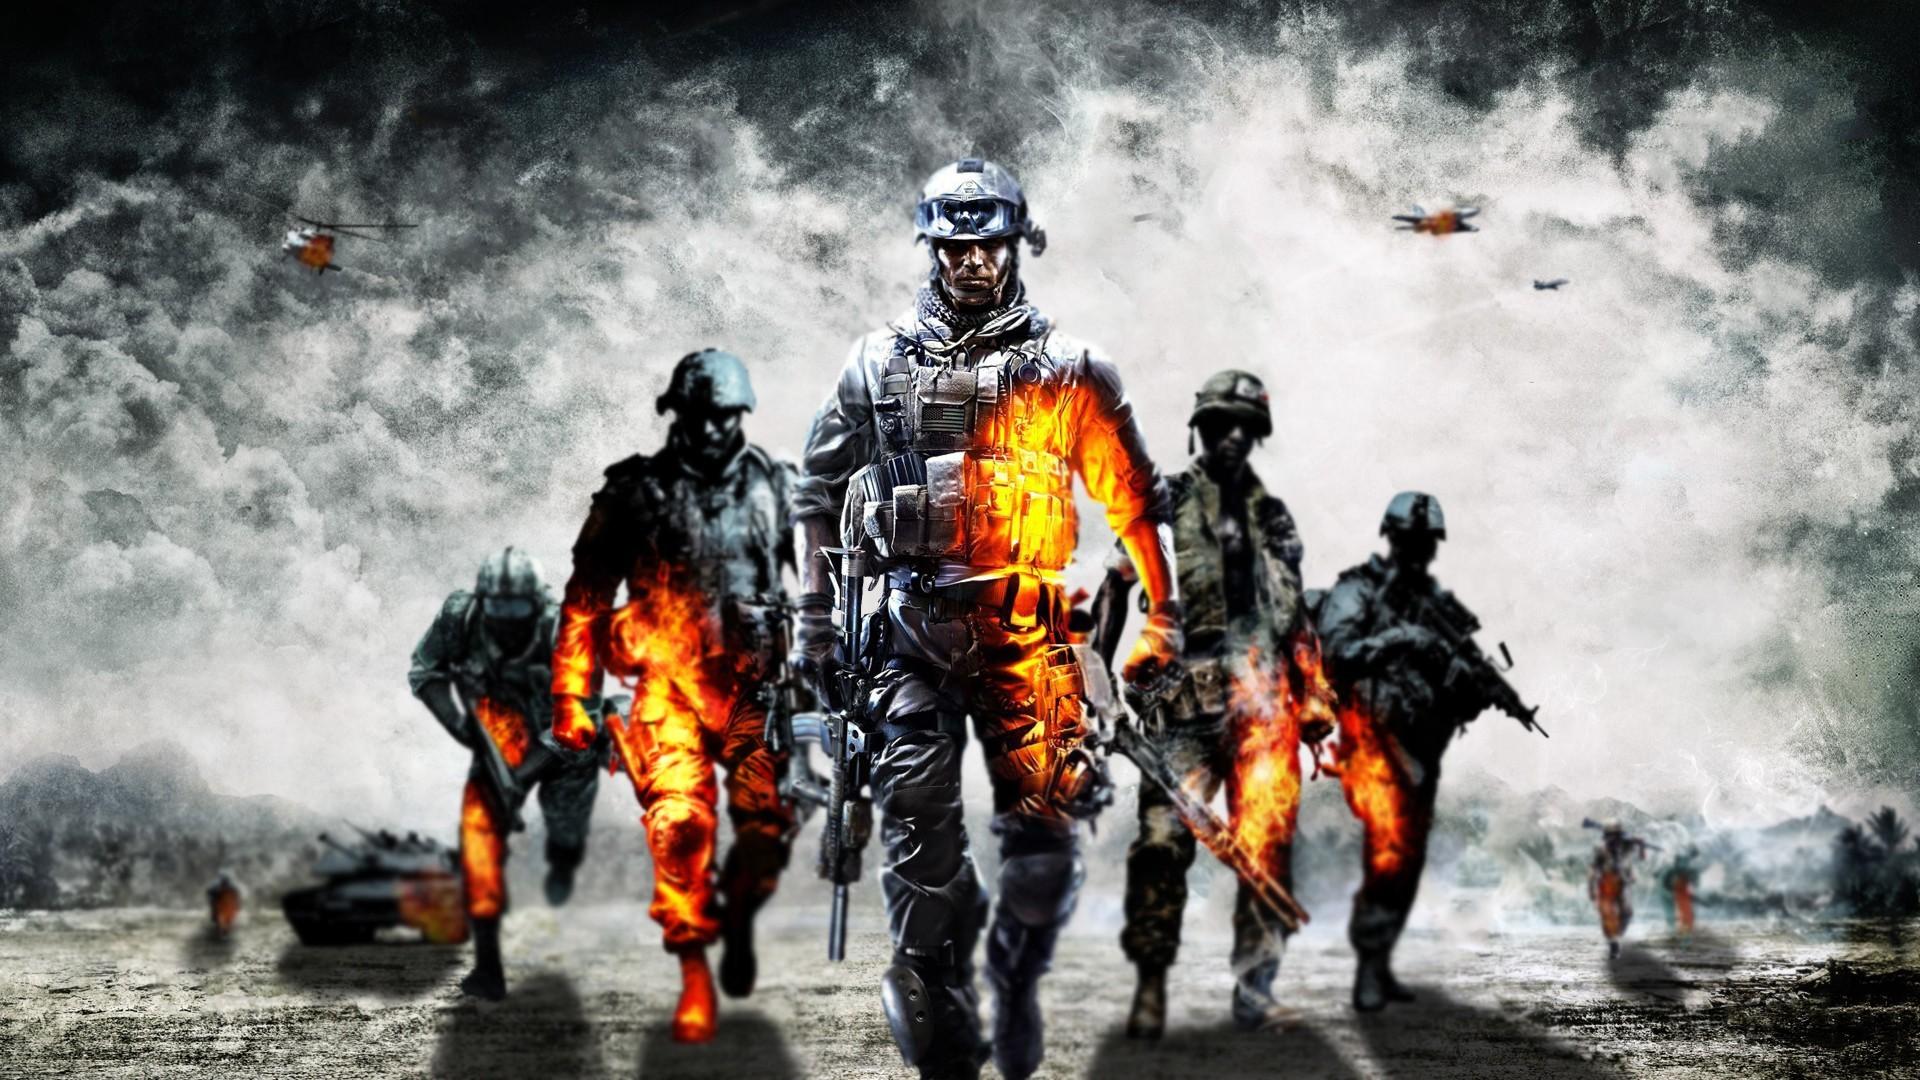 The Most Epic Battlefield Wallpaper Ever image – MattmanDude